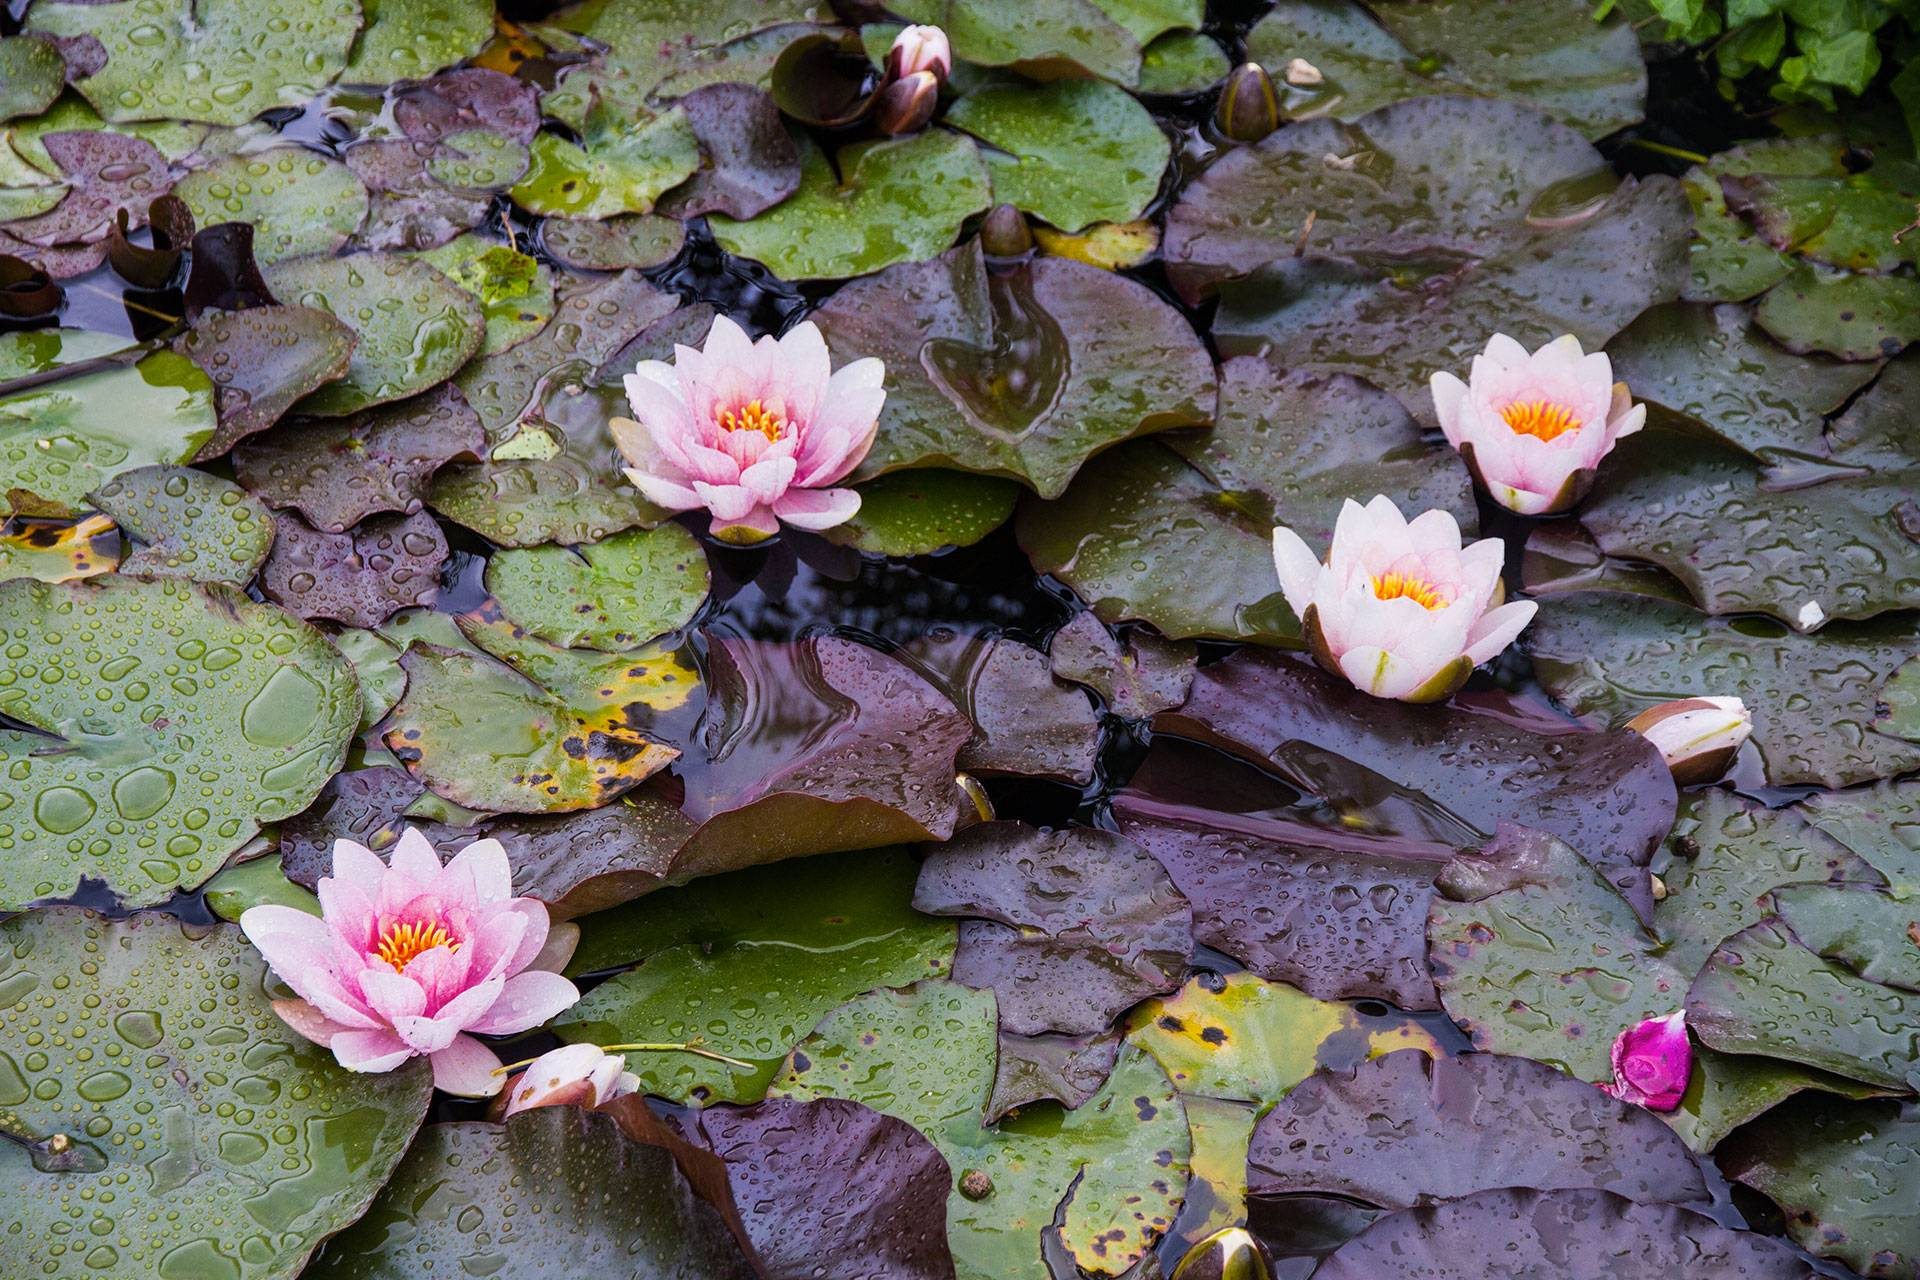 Photo 3: Florence - Le jardin des roses